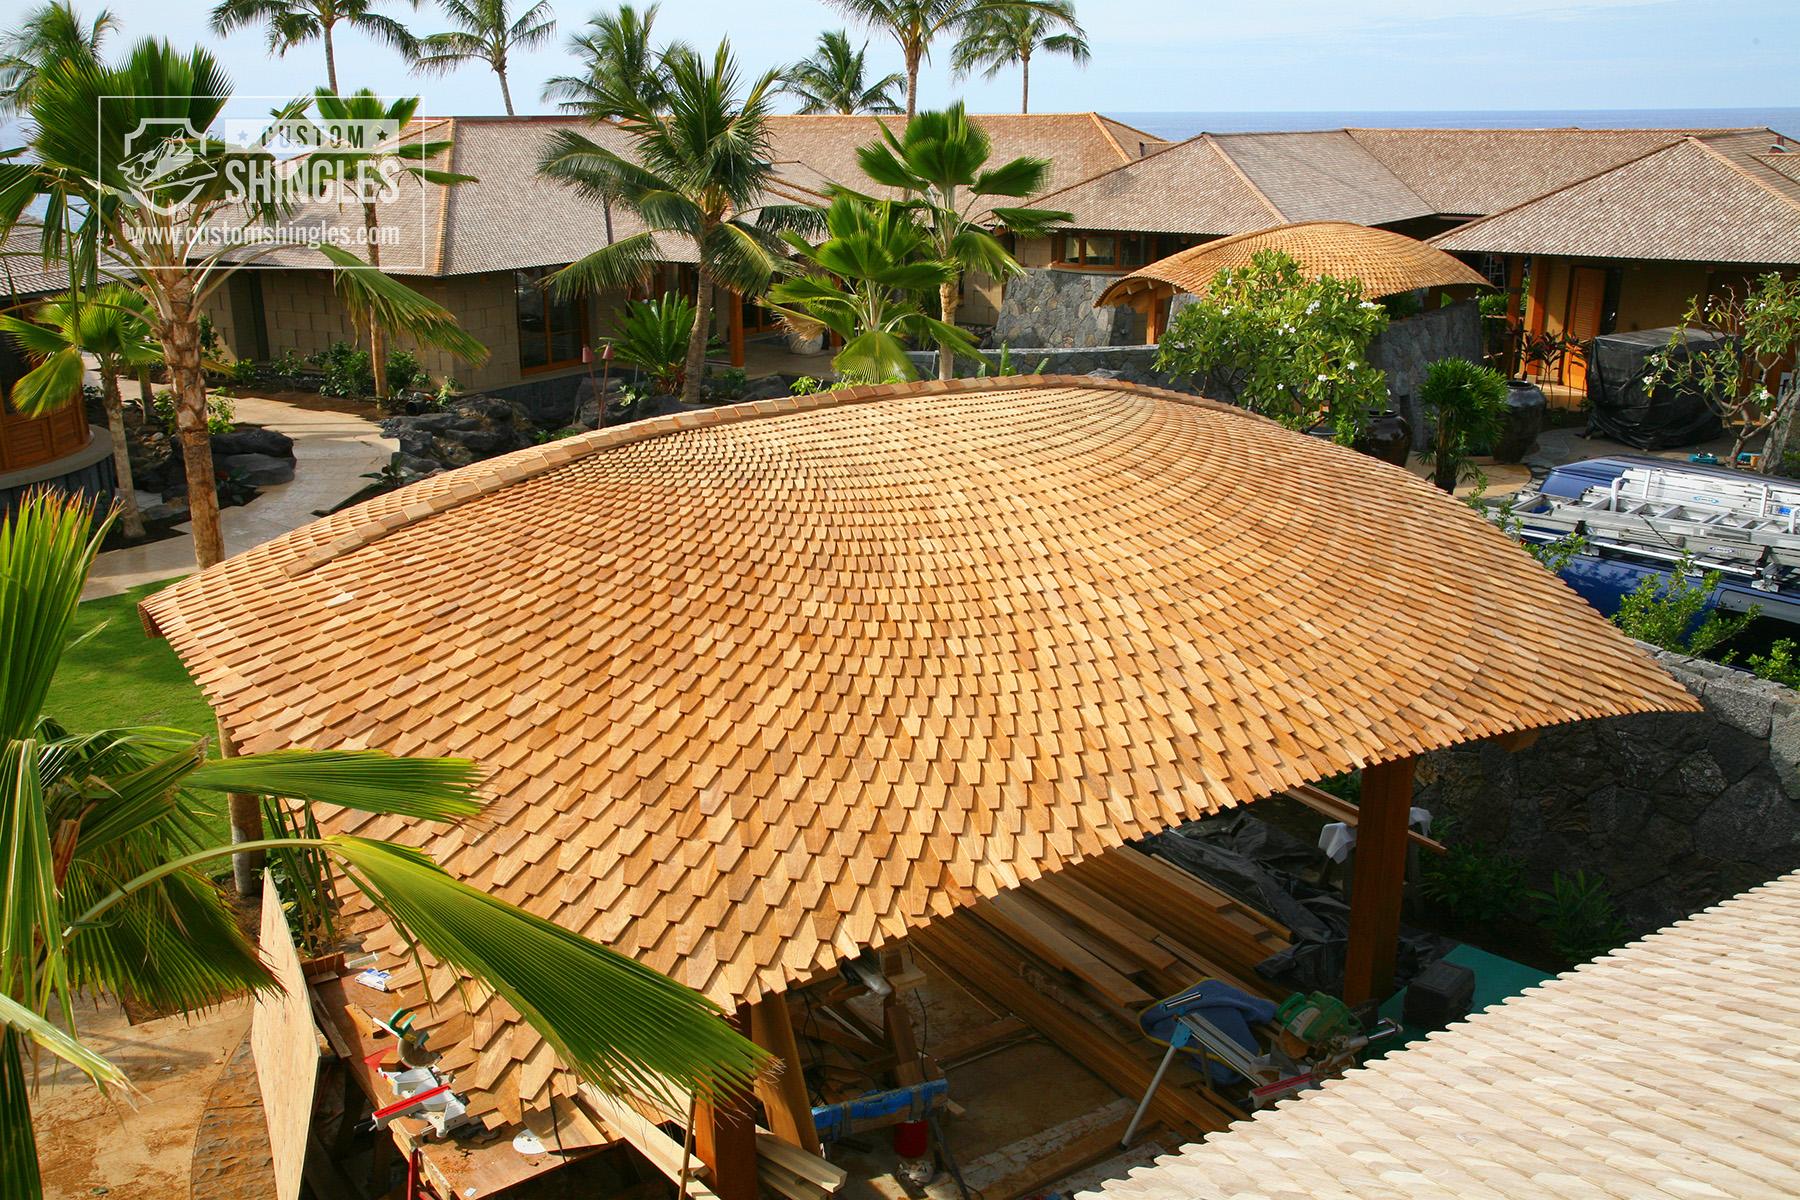 Kona,-Hawaii-Residence-with-Onsite-Steam-Bent-Teak-Shingles-(C) copy.jpg